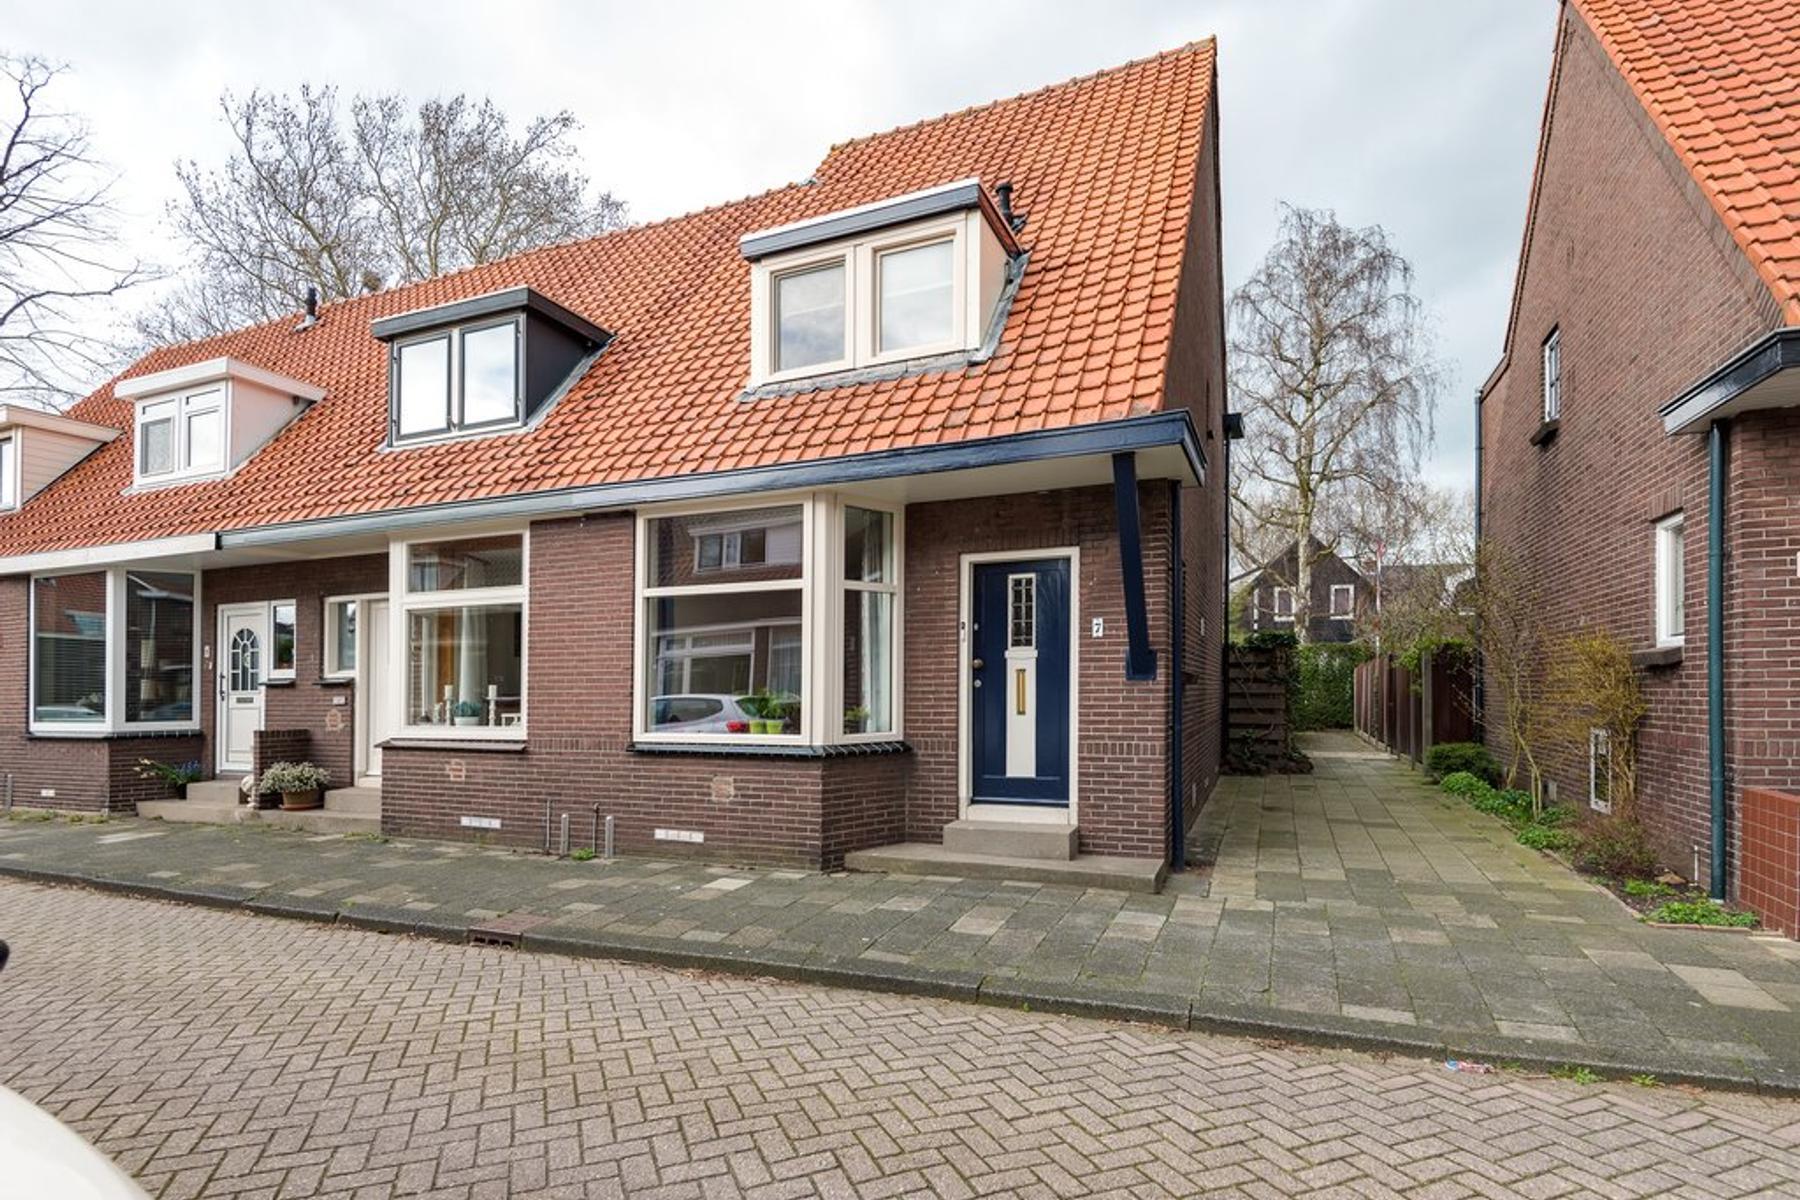 Oranjestraat 7 in Hendrik-Ido-Ambacht 3341 XM